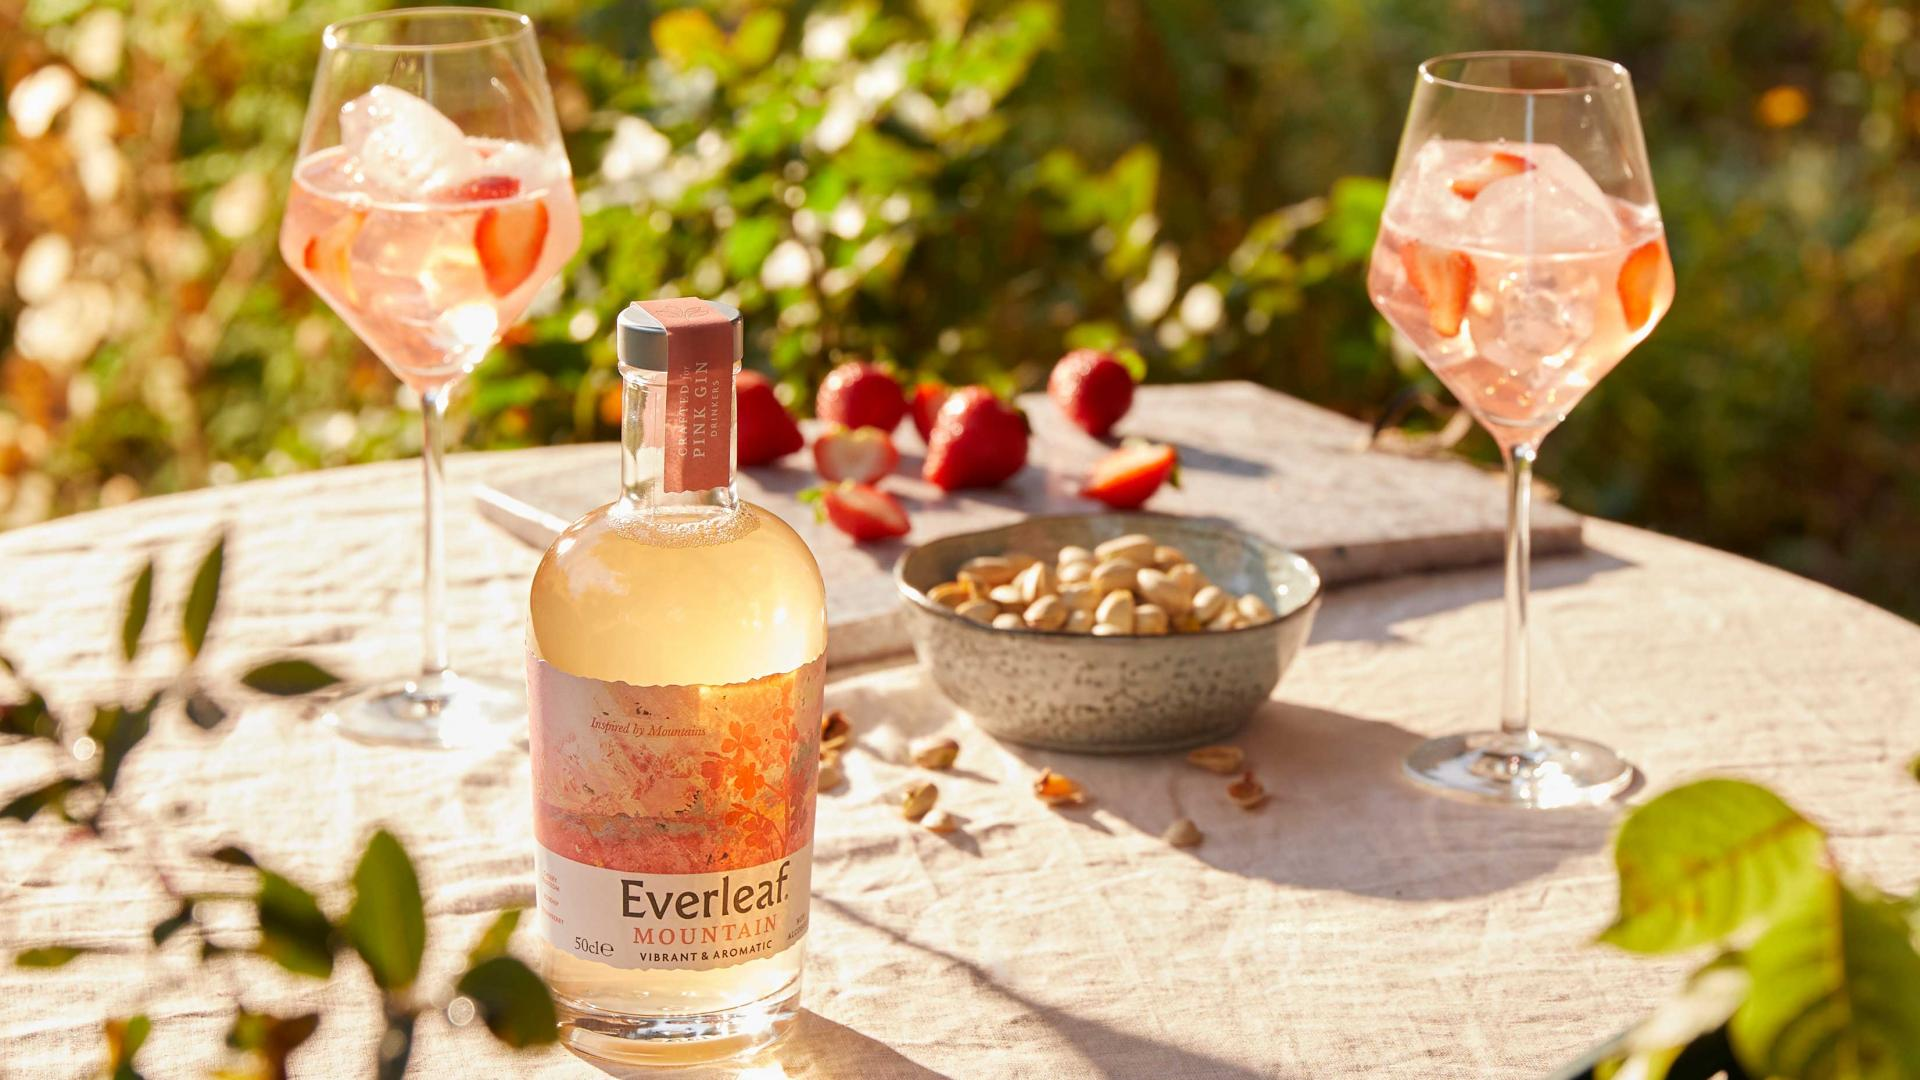 Non-alcoholic spirits: Everleaf Mountain